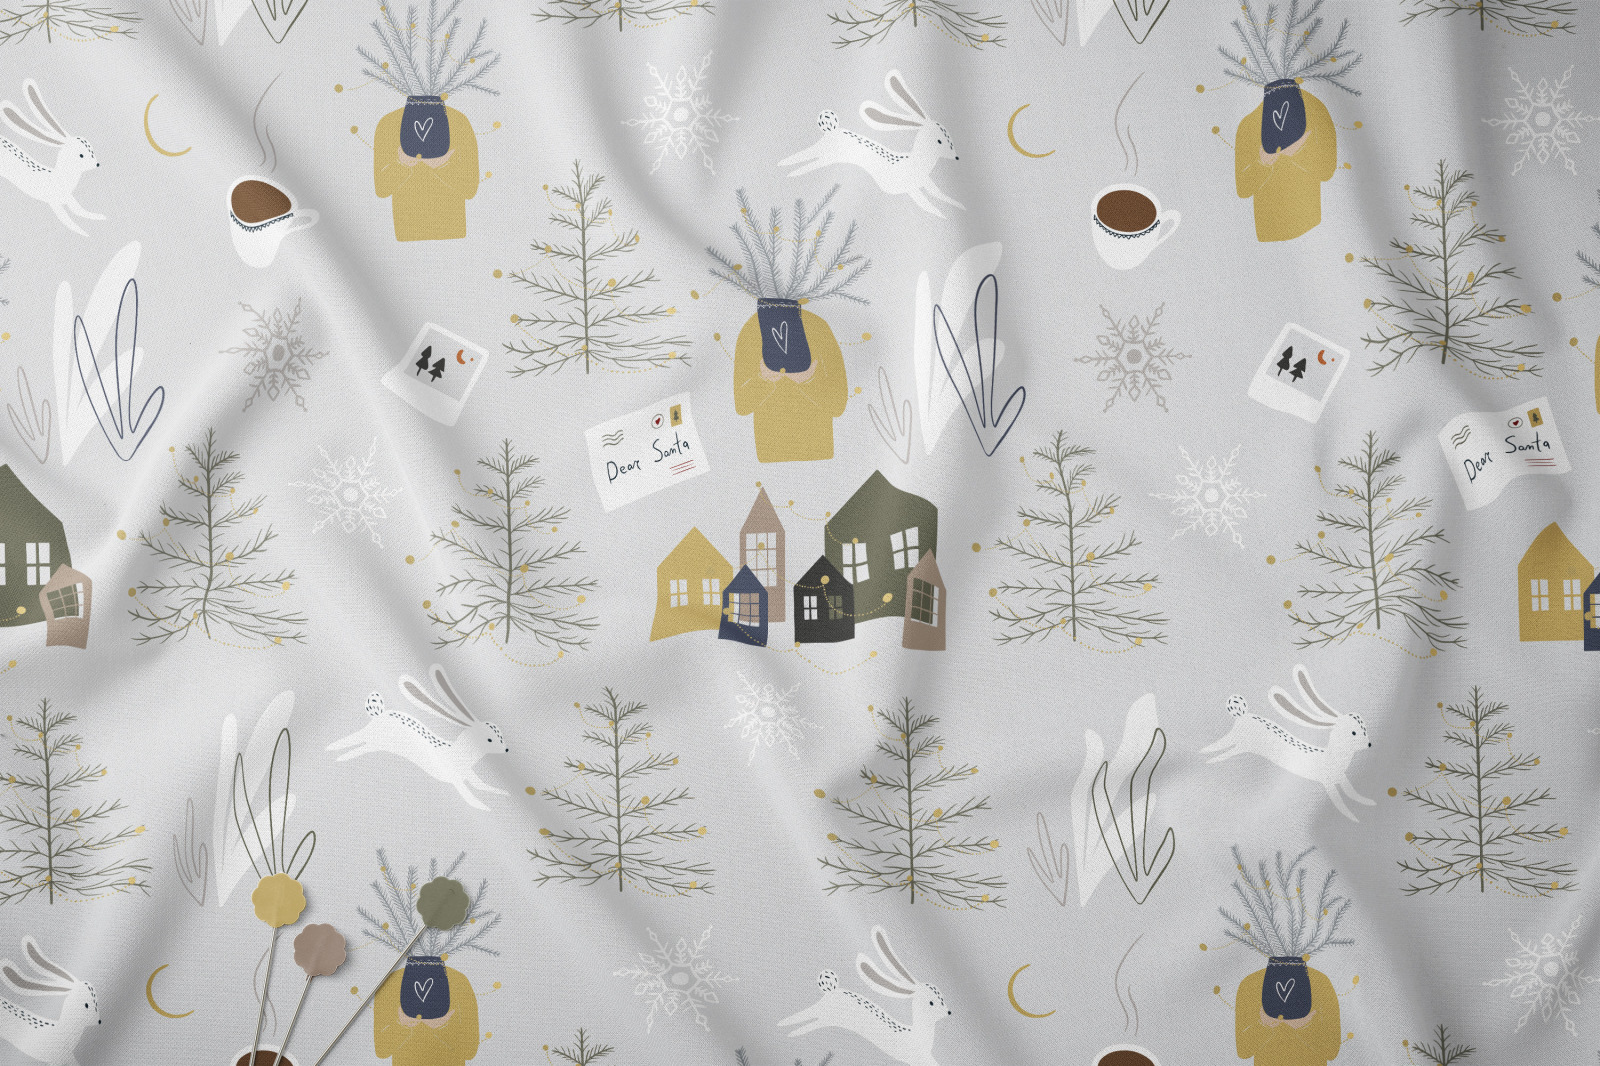 Winter Wonderland - Christmas Pack